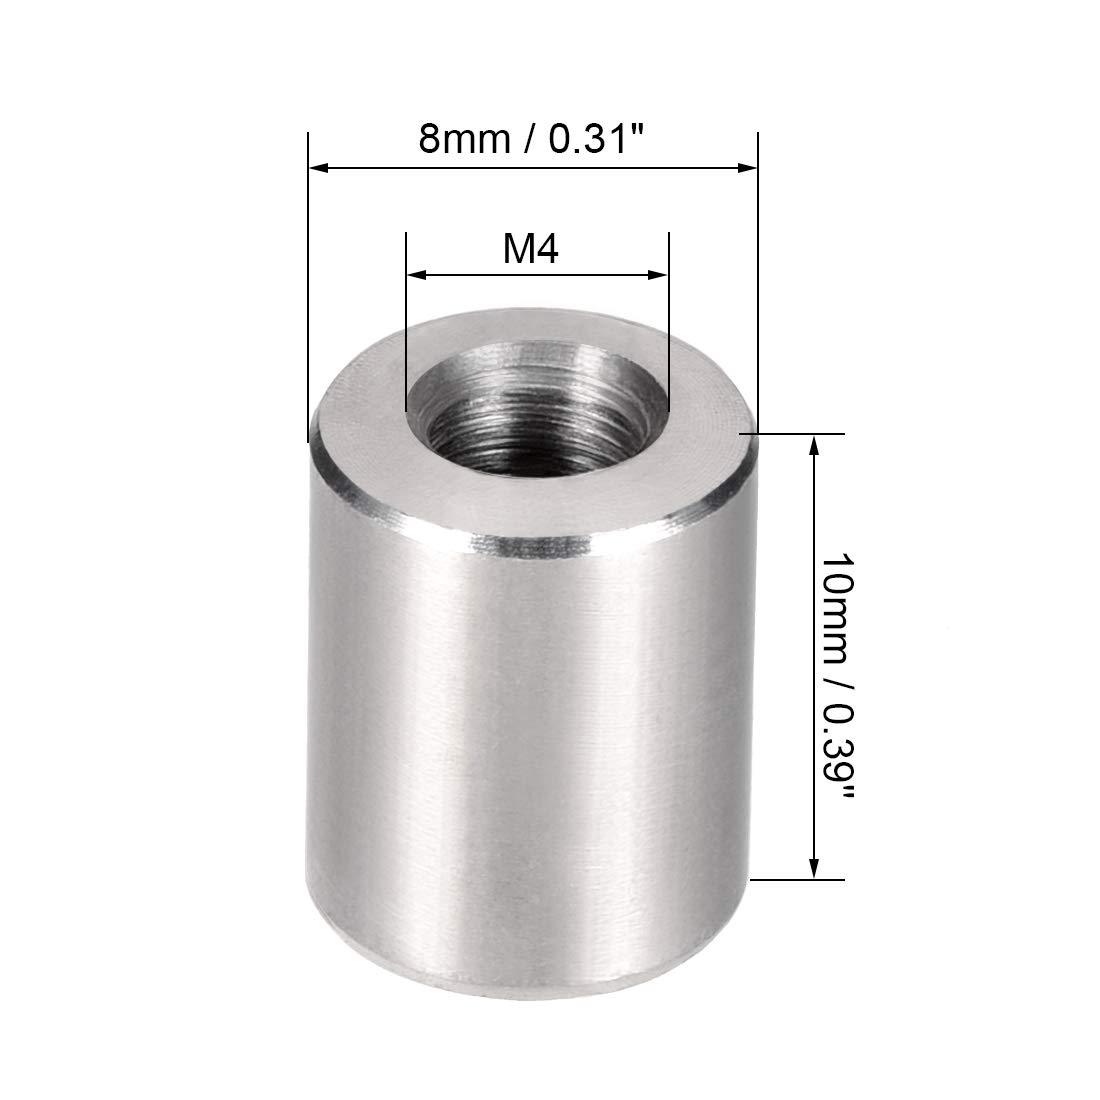 sourcing map Tuerca conector redondas M4x10mm de altura del manguito tuerca de v/ástago de acero inoxidable 304 10 pzas